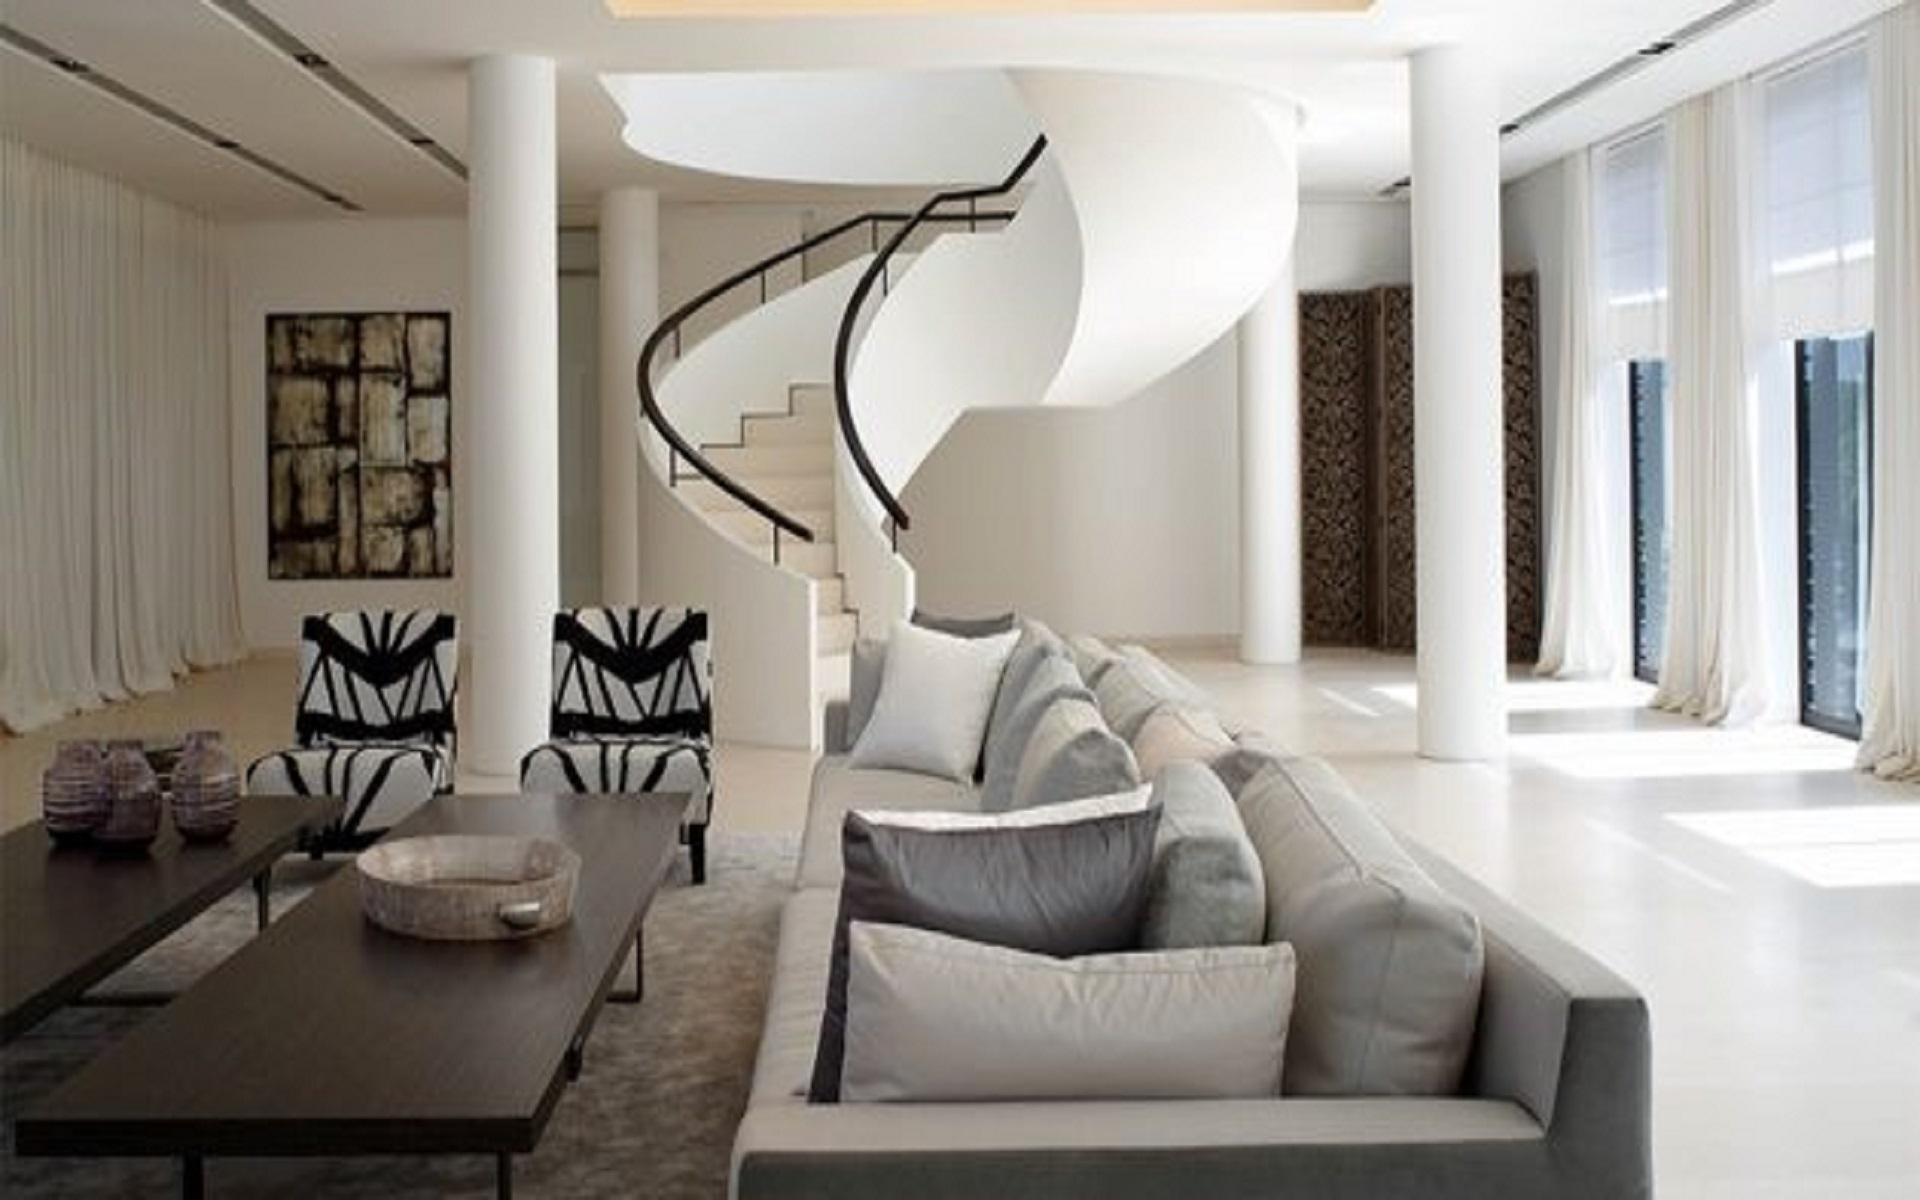 10 Fantastic Tips to Make Your Residence Look Elegant